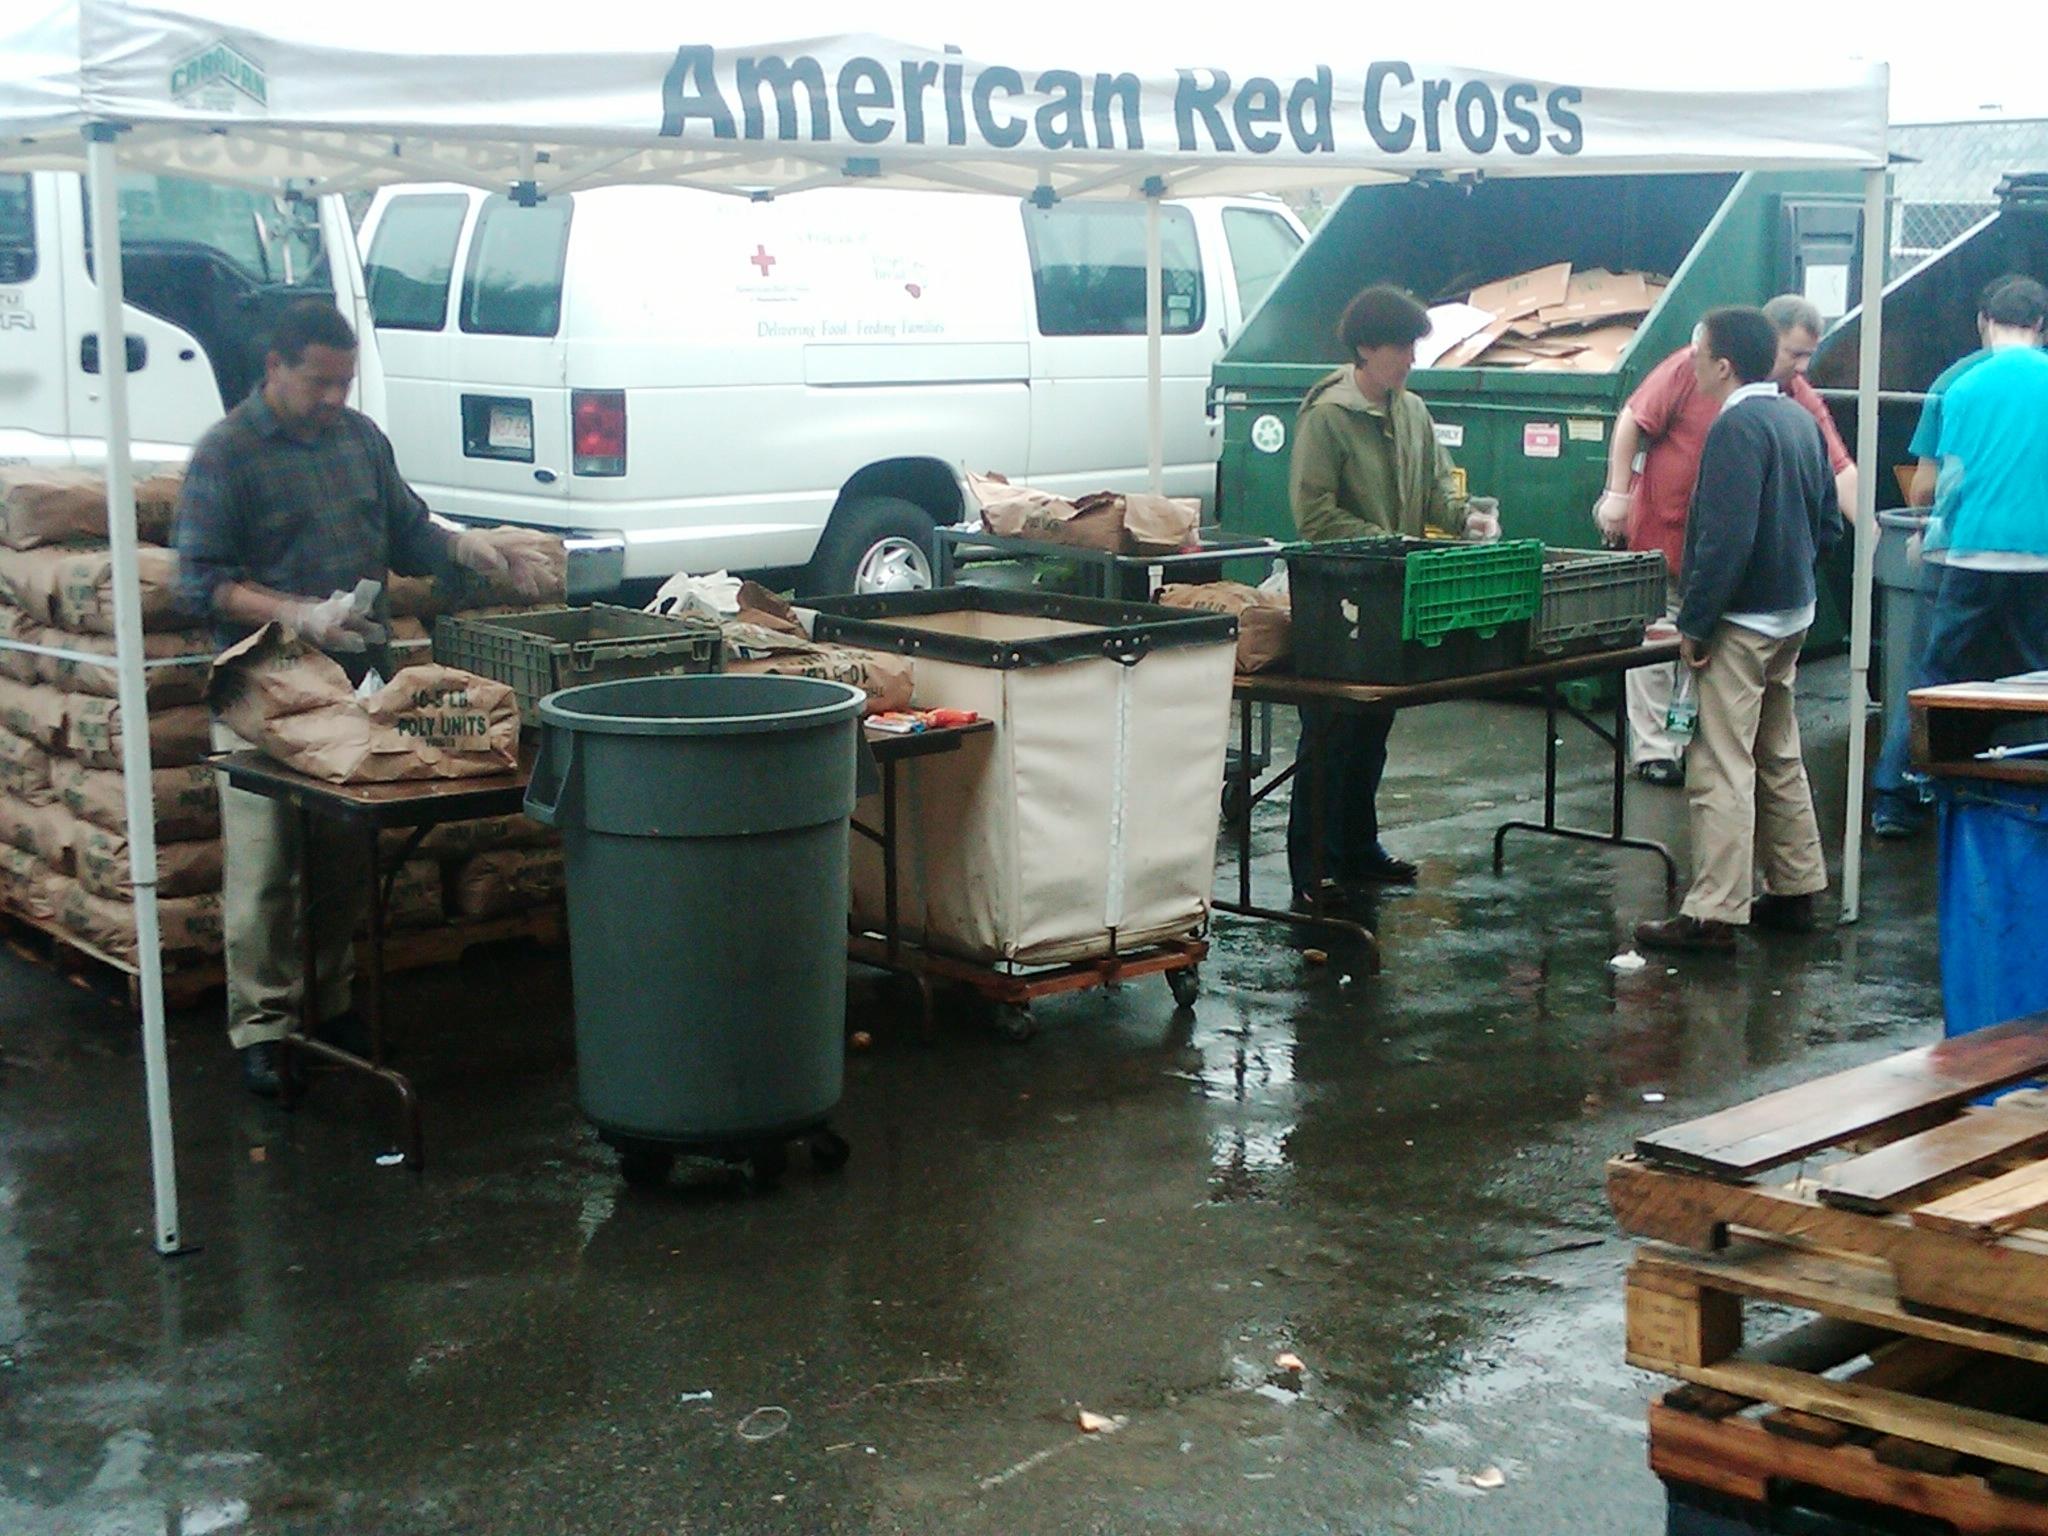 Red Cross Food Pantry Boston Ma